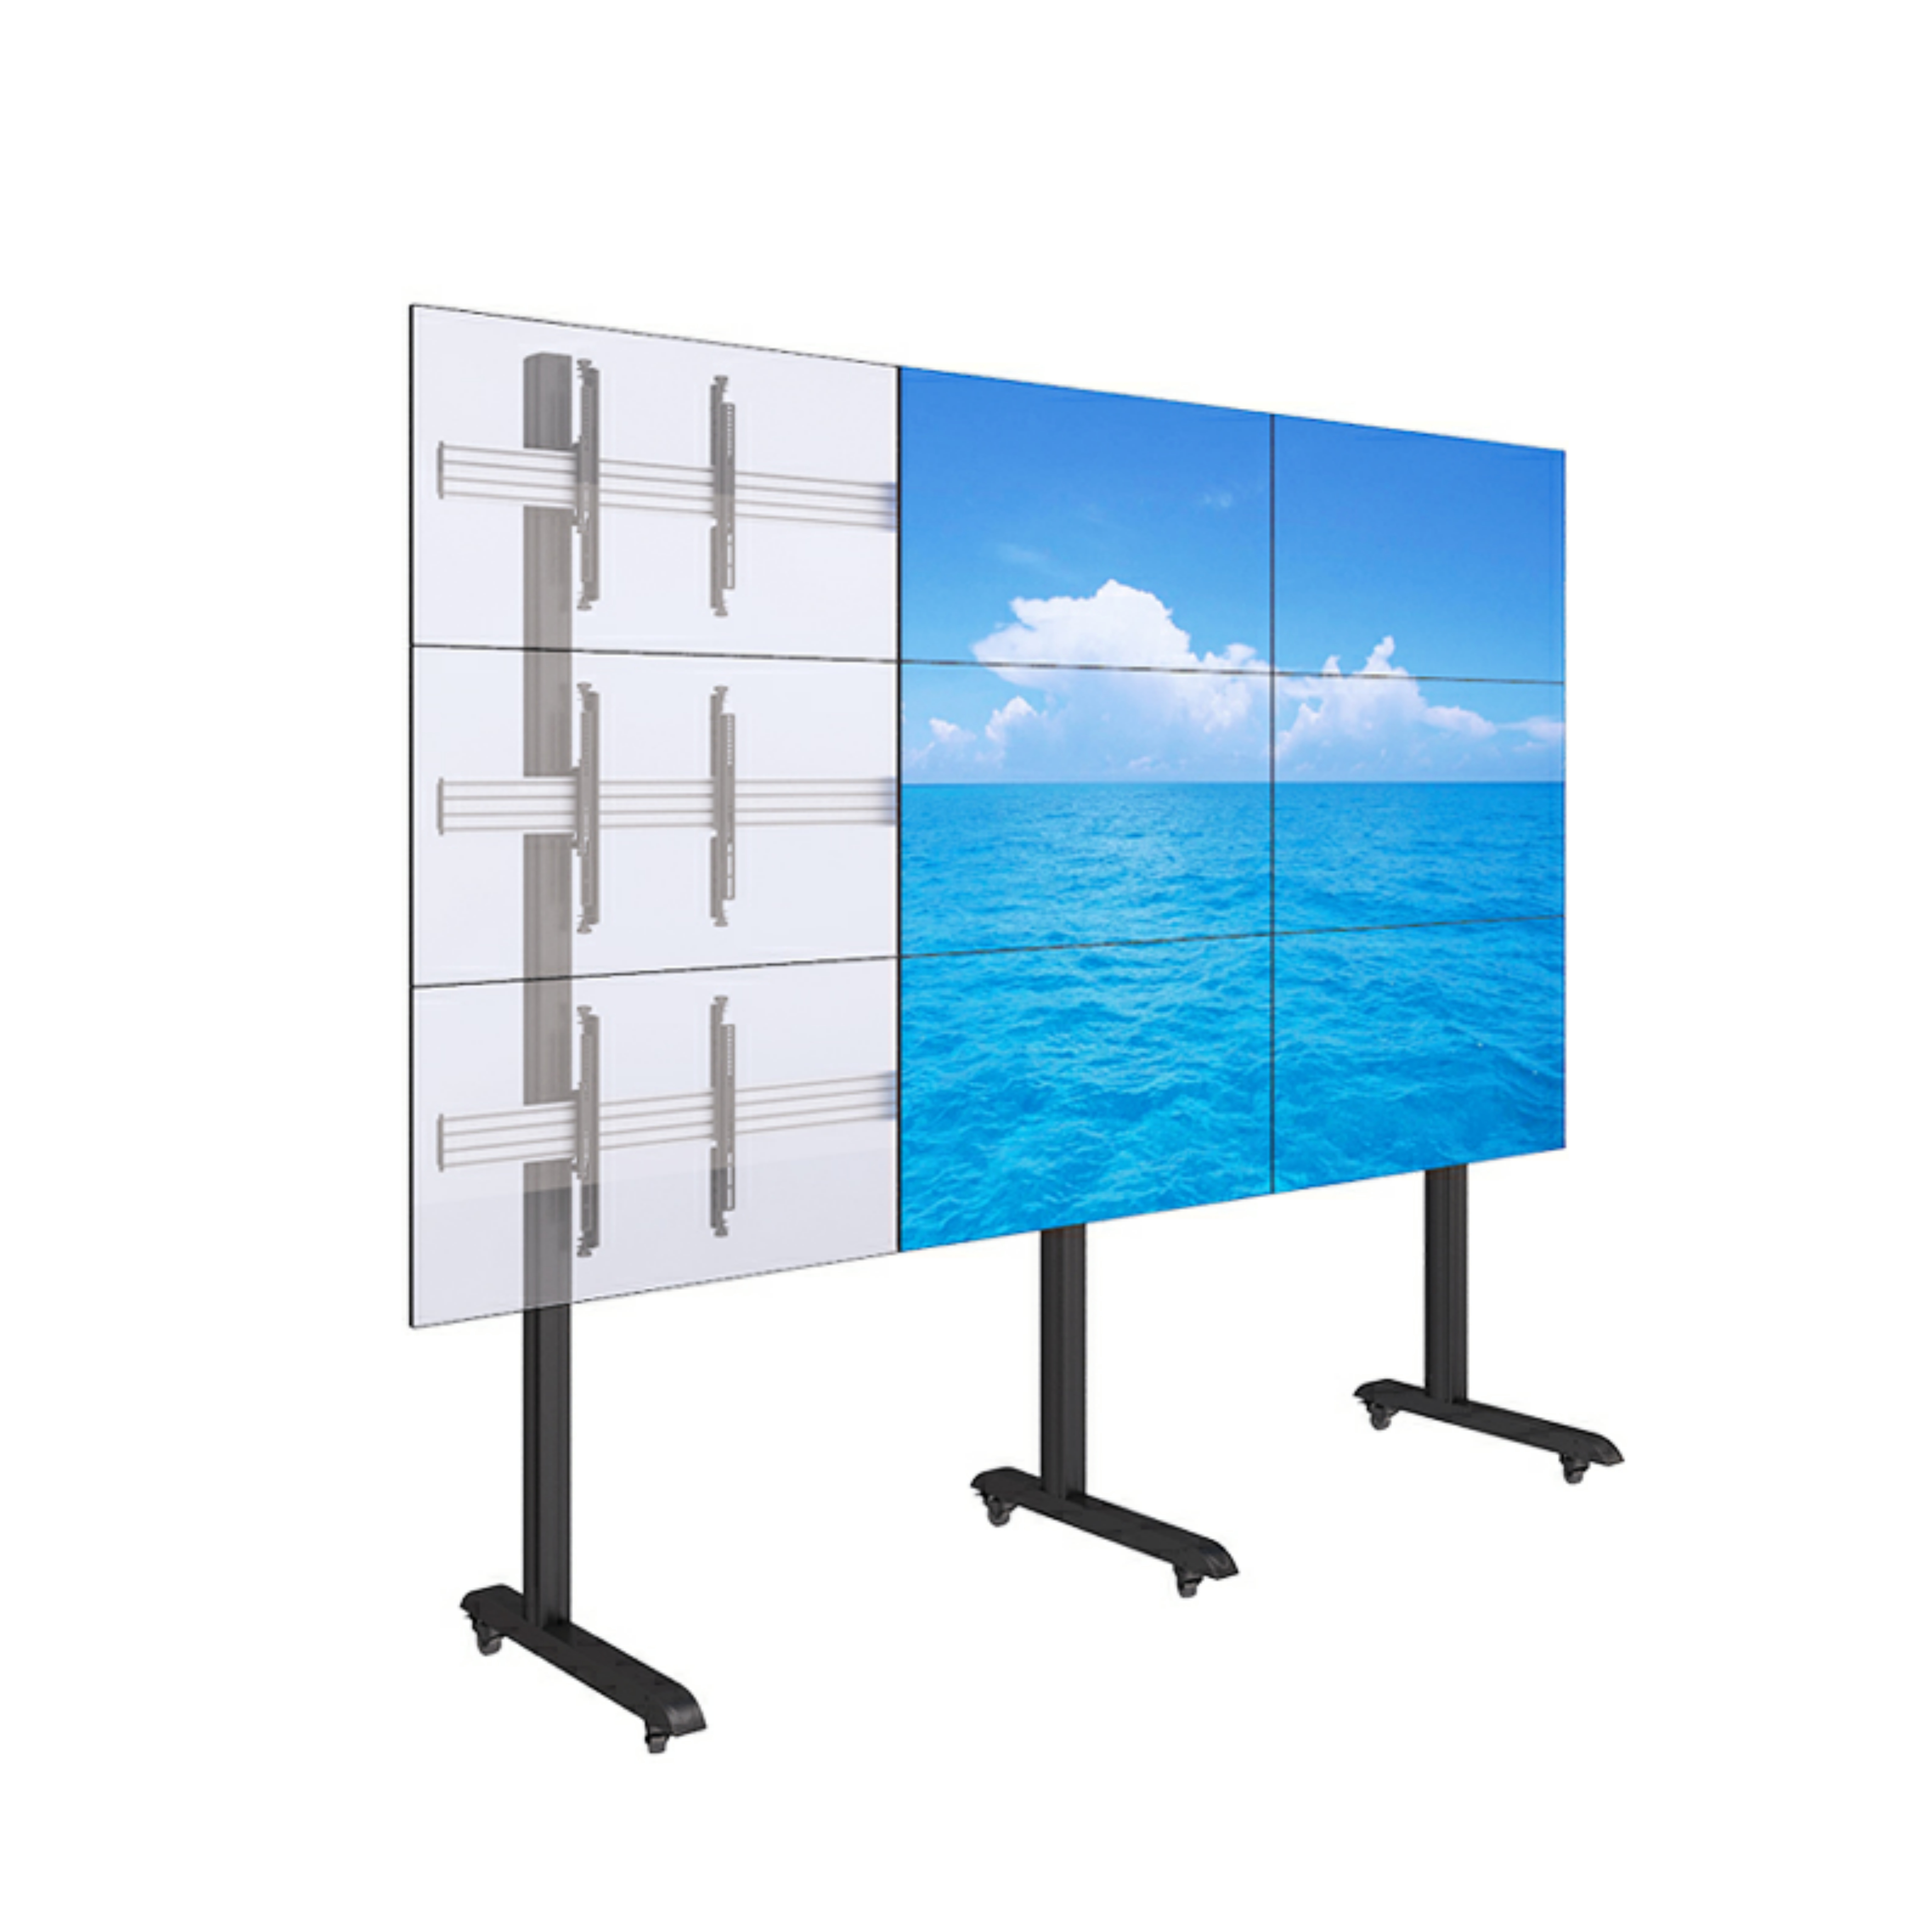 Video Wall Trolley VWT3B3 (3x3) - TV Bracket and Mount